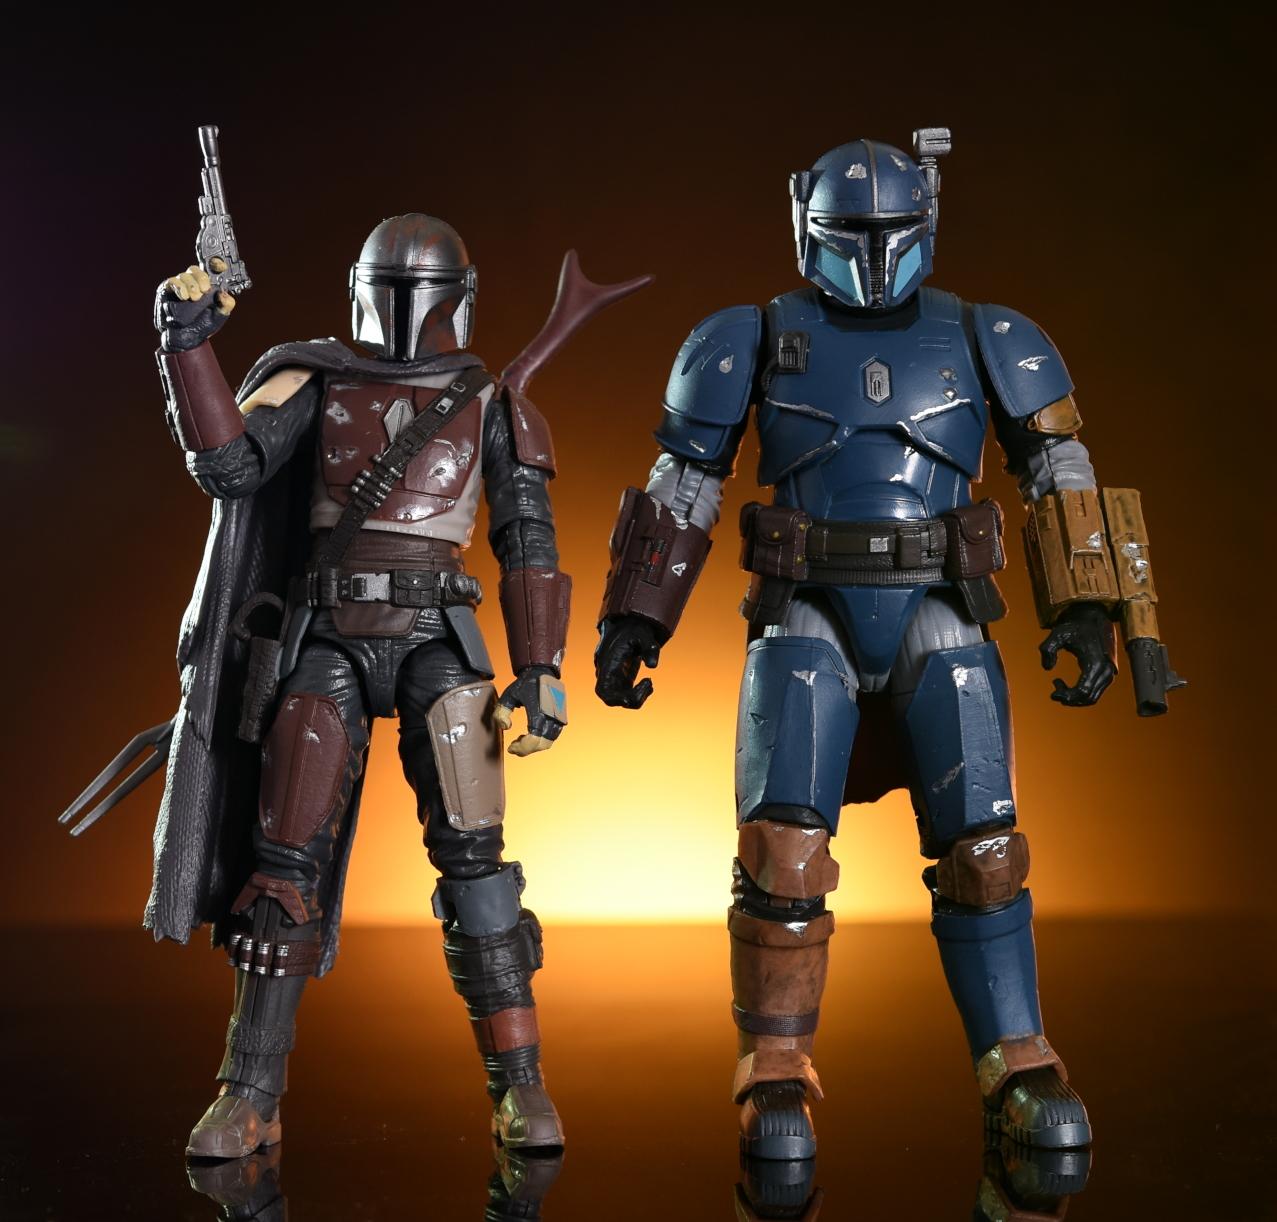 Black Series Hasbro Star Wars Deluxe Heavy Infantry Mandalorian